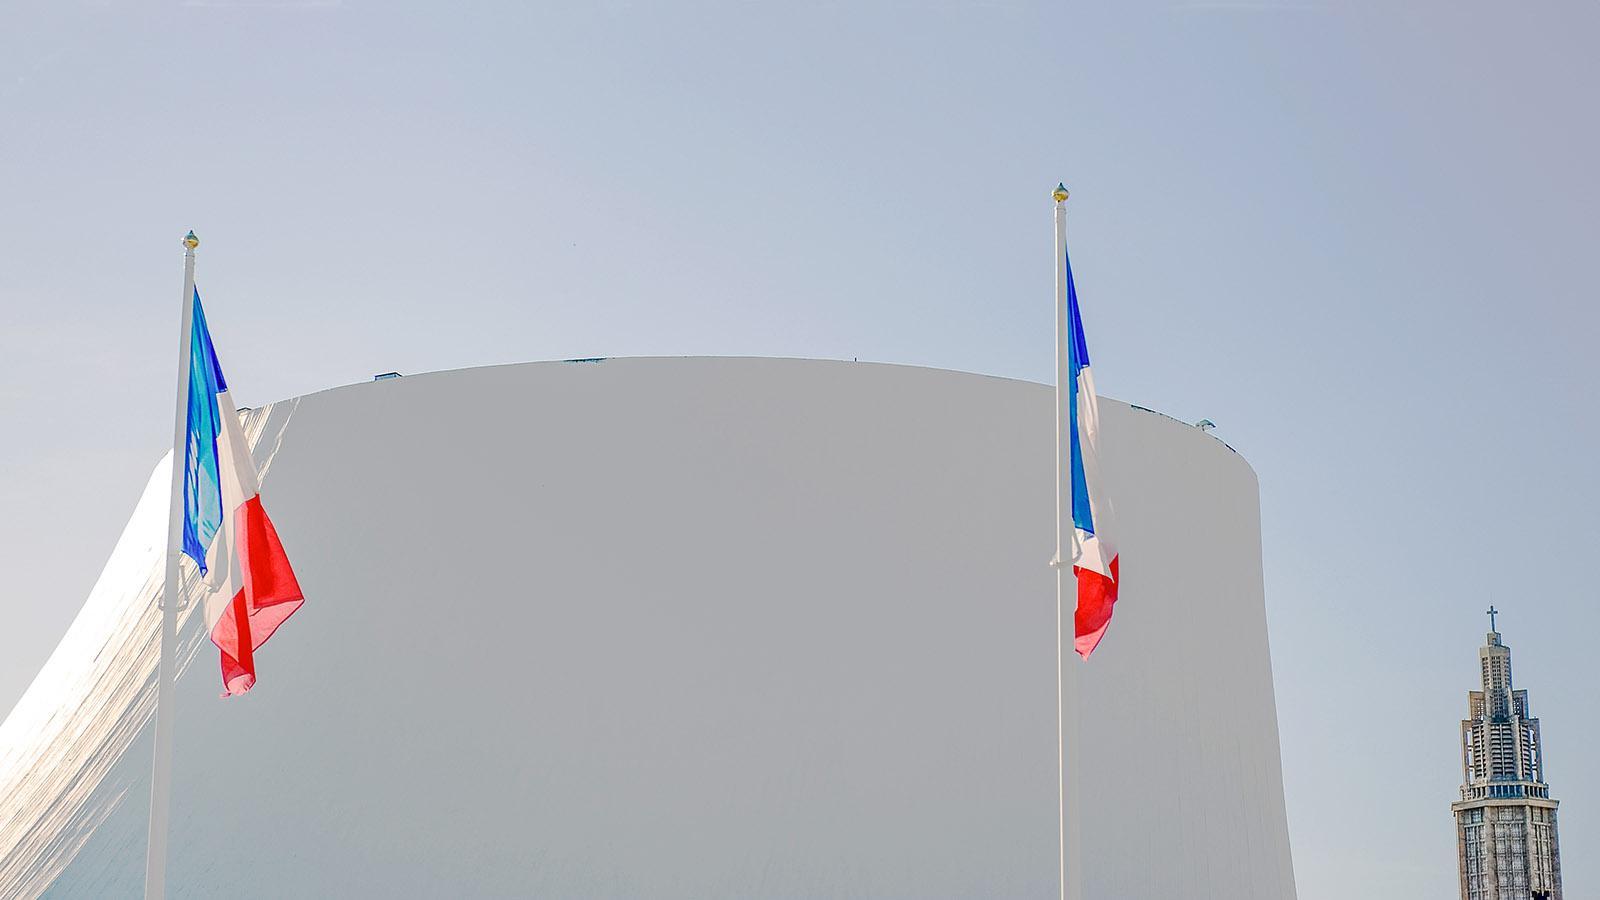 Le Havre: Grand Volcan und Saint-Joseph. Foto: Hilke Maunder